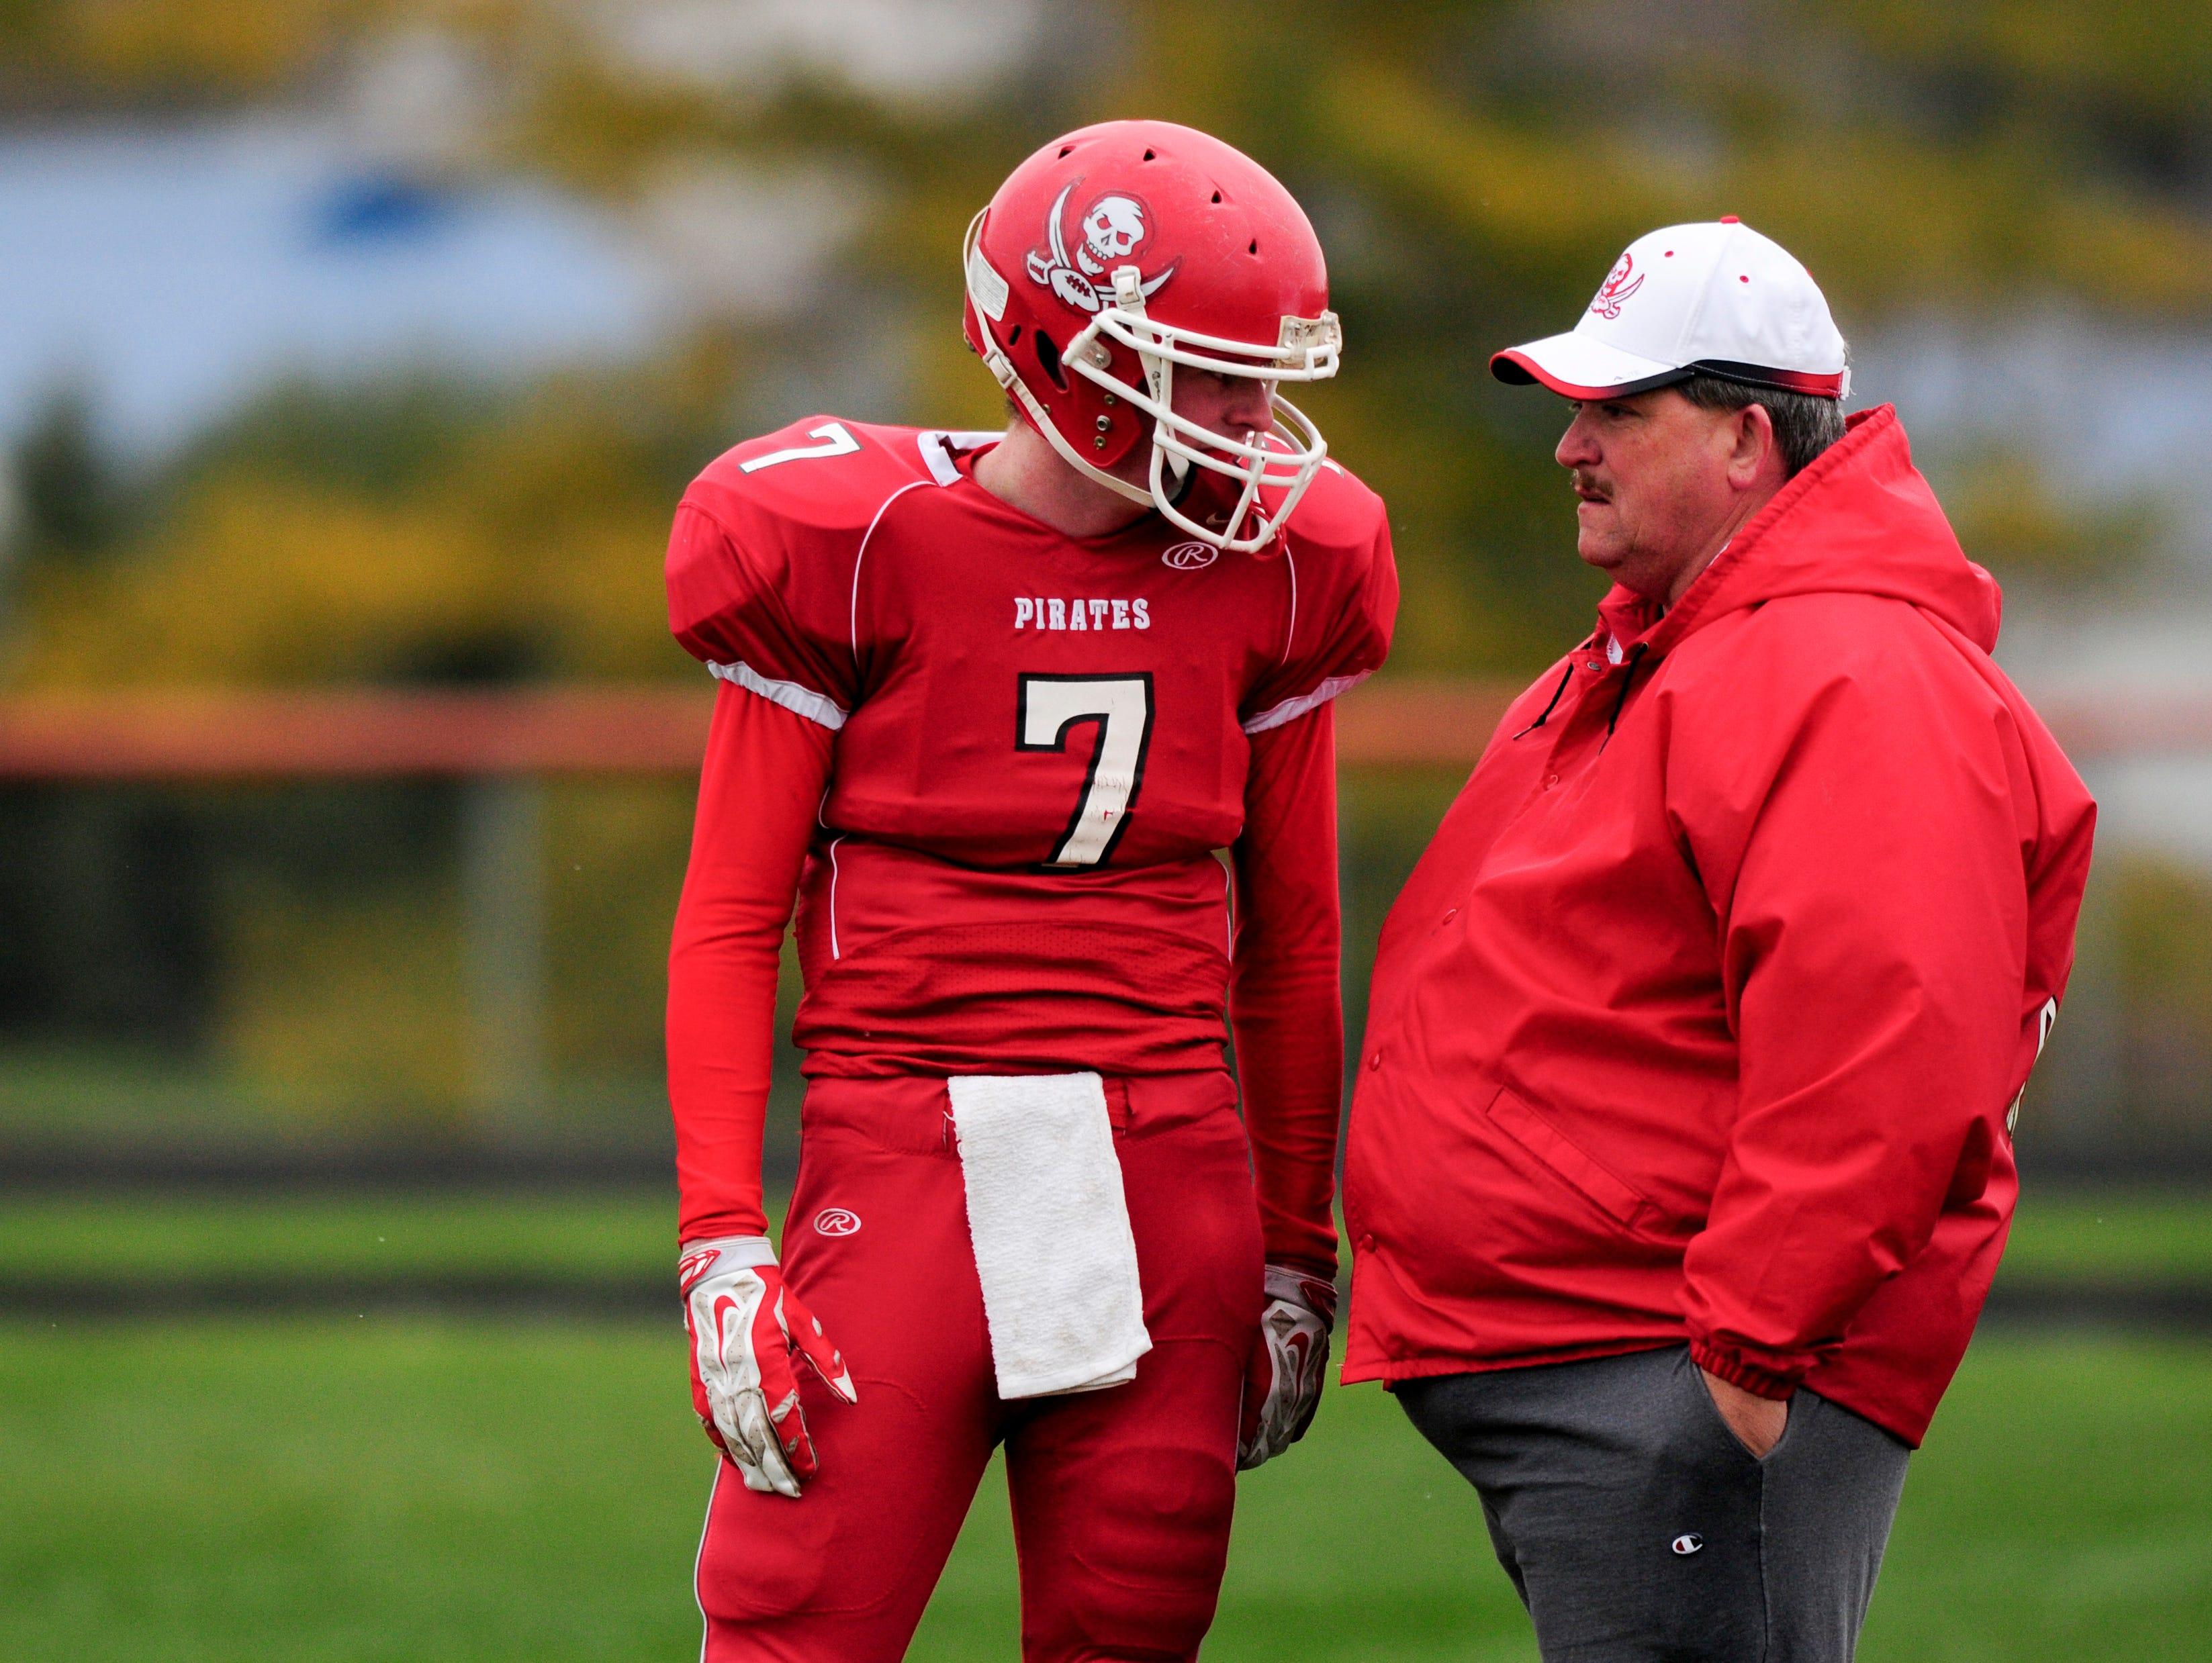 Peck senior Tom Gallagher speaks with coach Rob McDaniel during an 8-man semifinal football game Saturday, Nov. 15, 2014 at Peck High School.